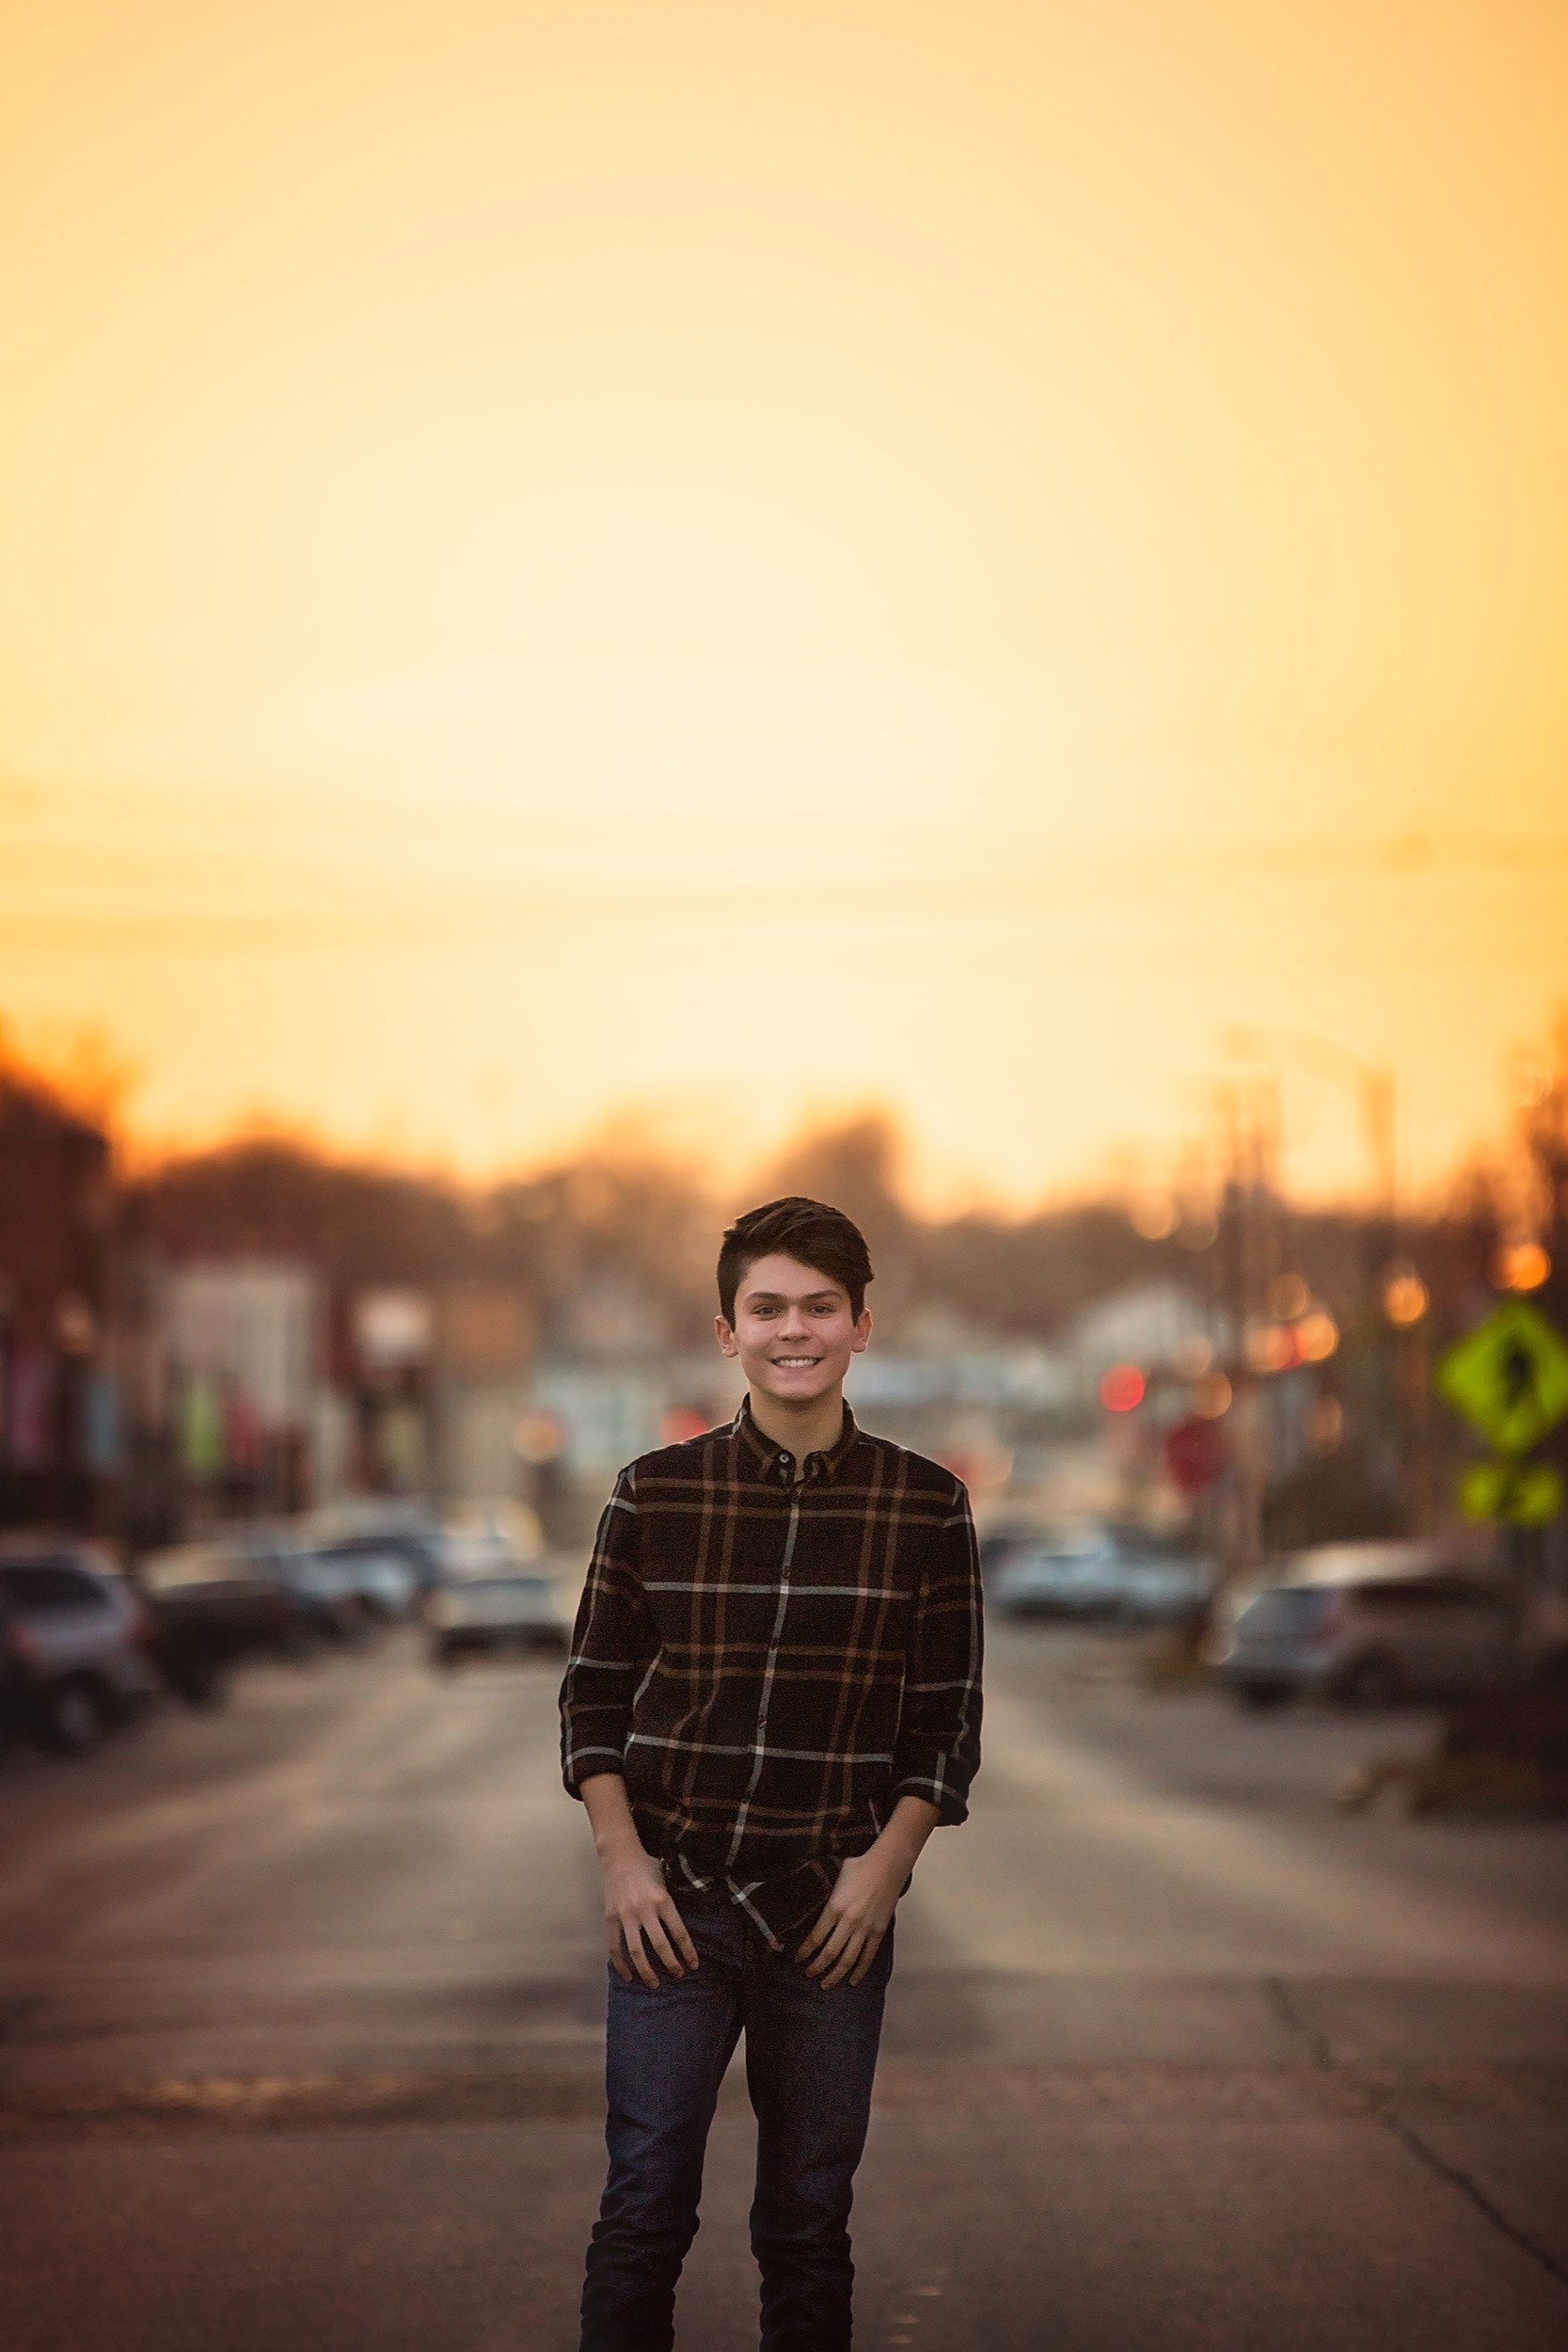 springfield-mo-senior-portrait-photography (77).jpg